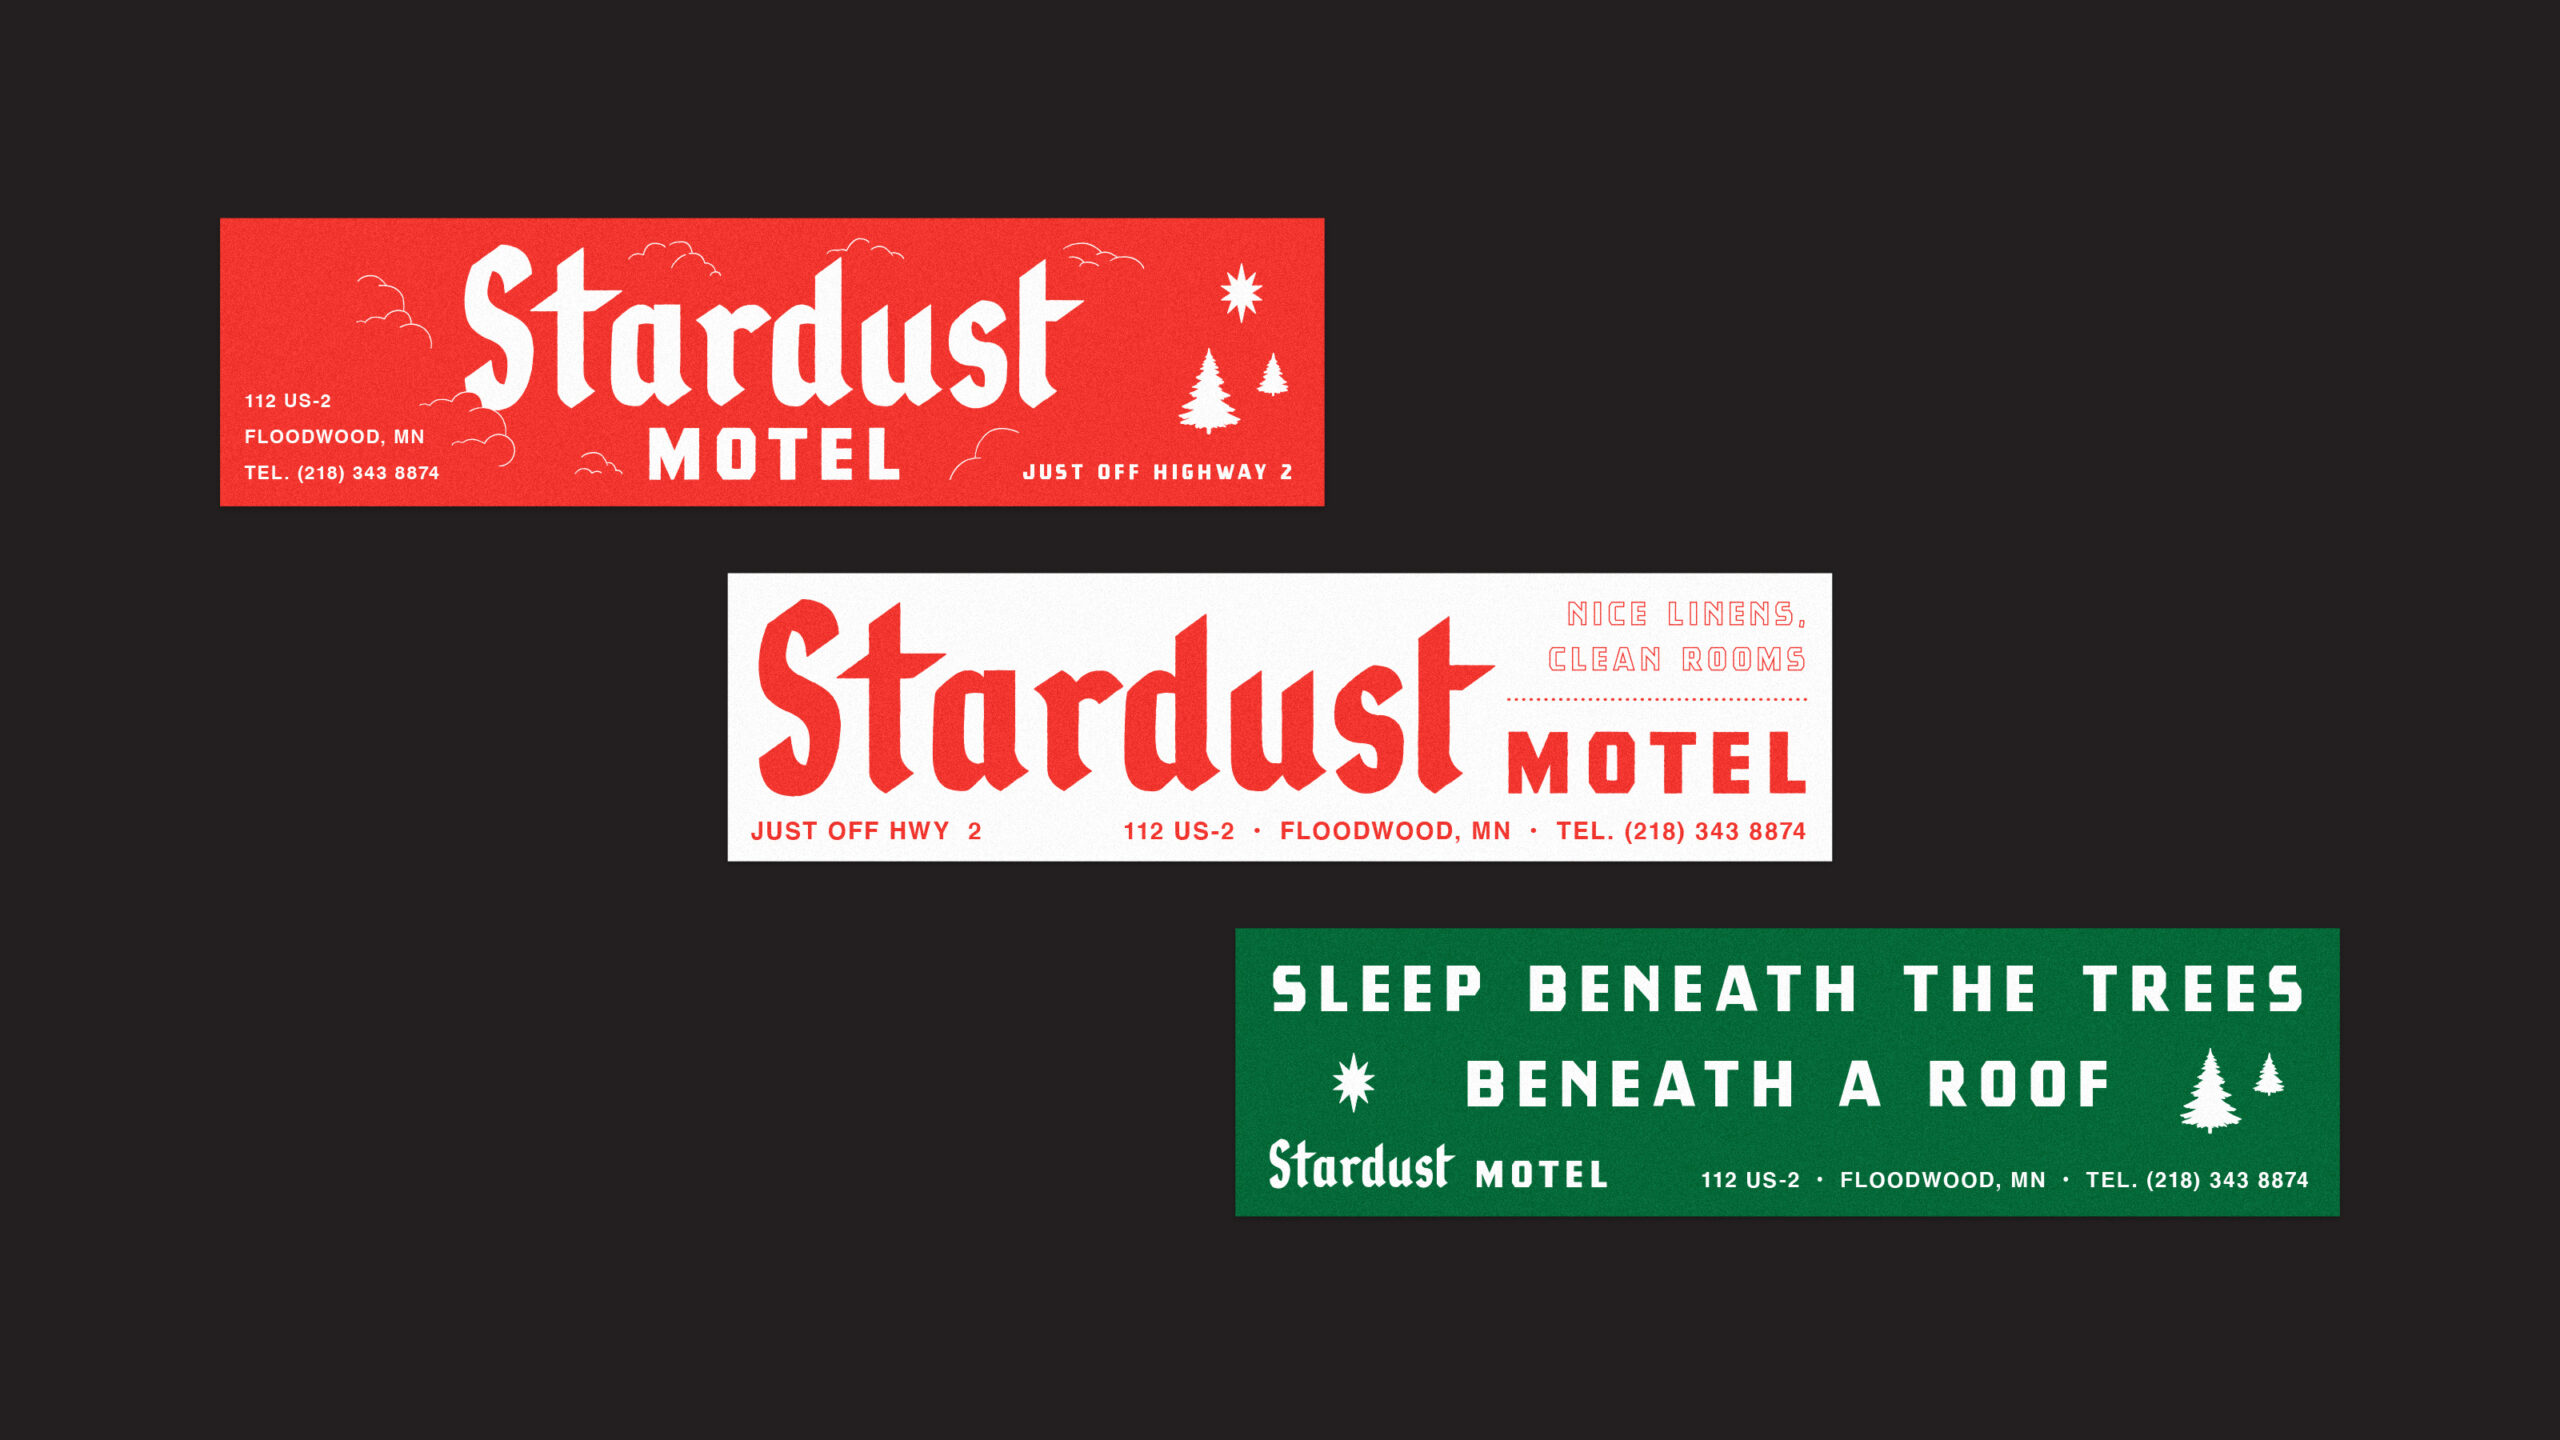 Stardust_Website_7